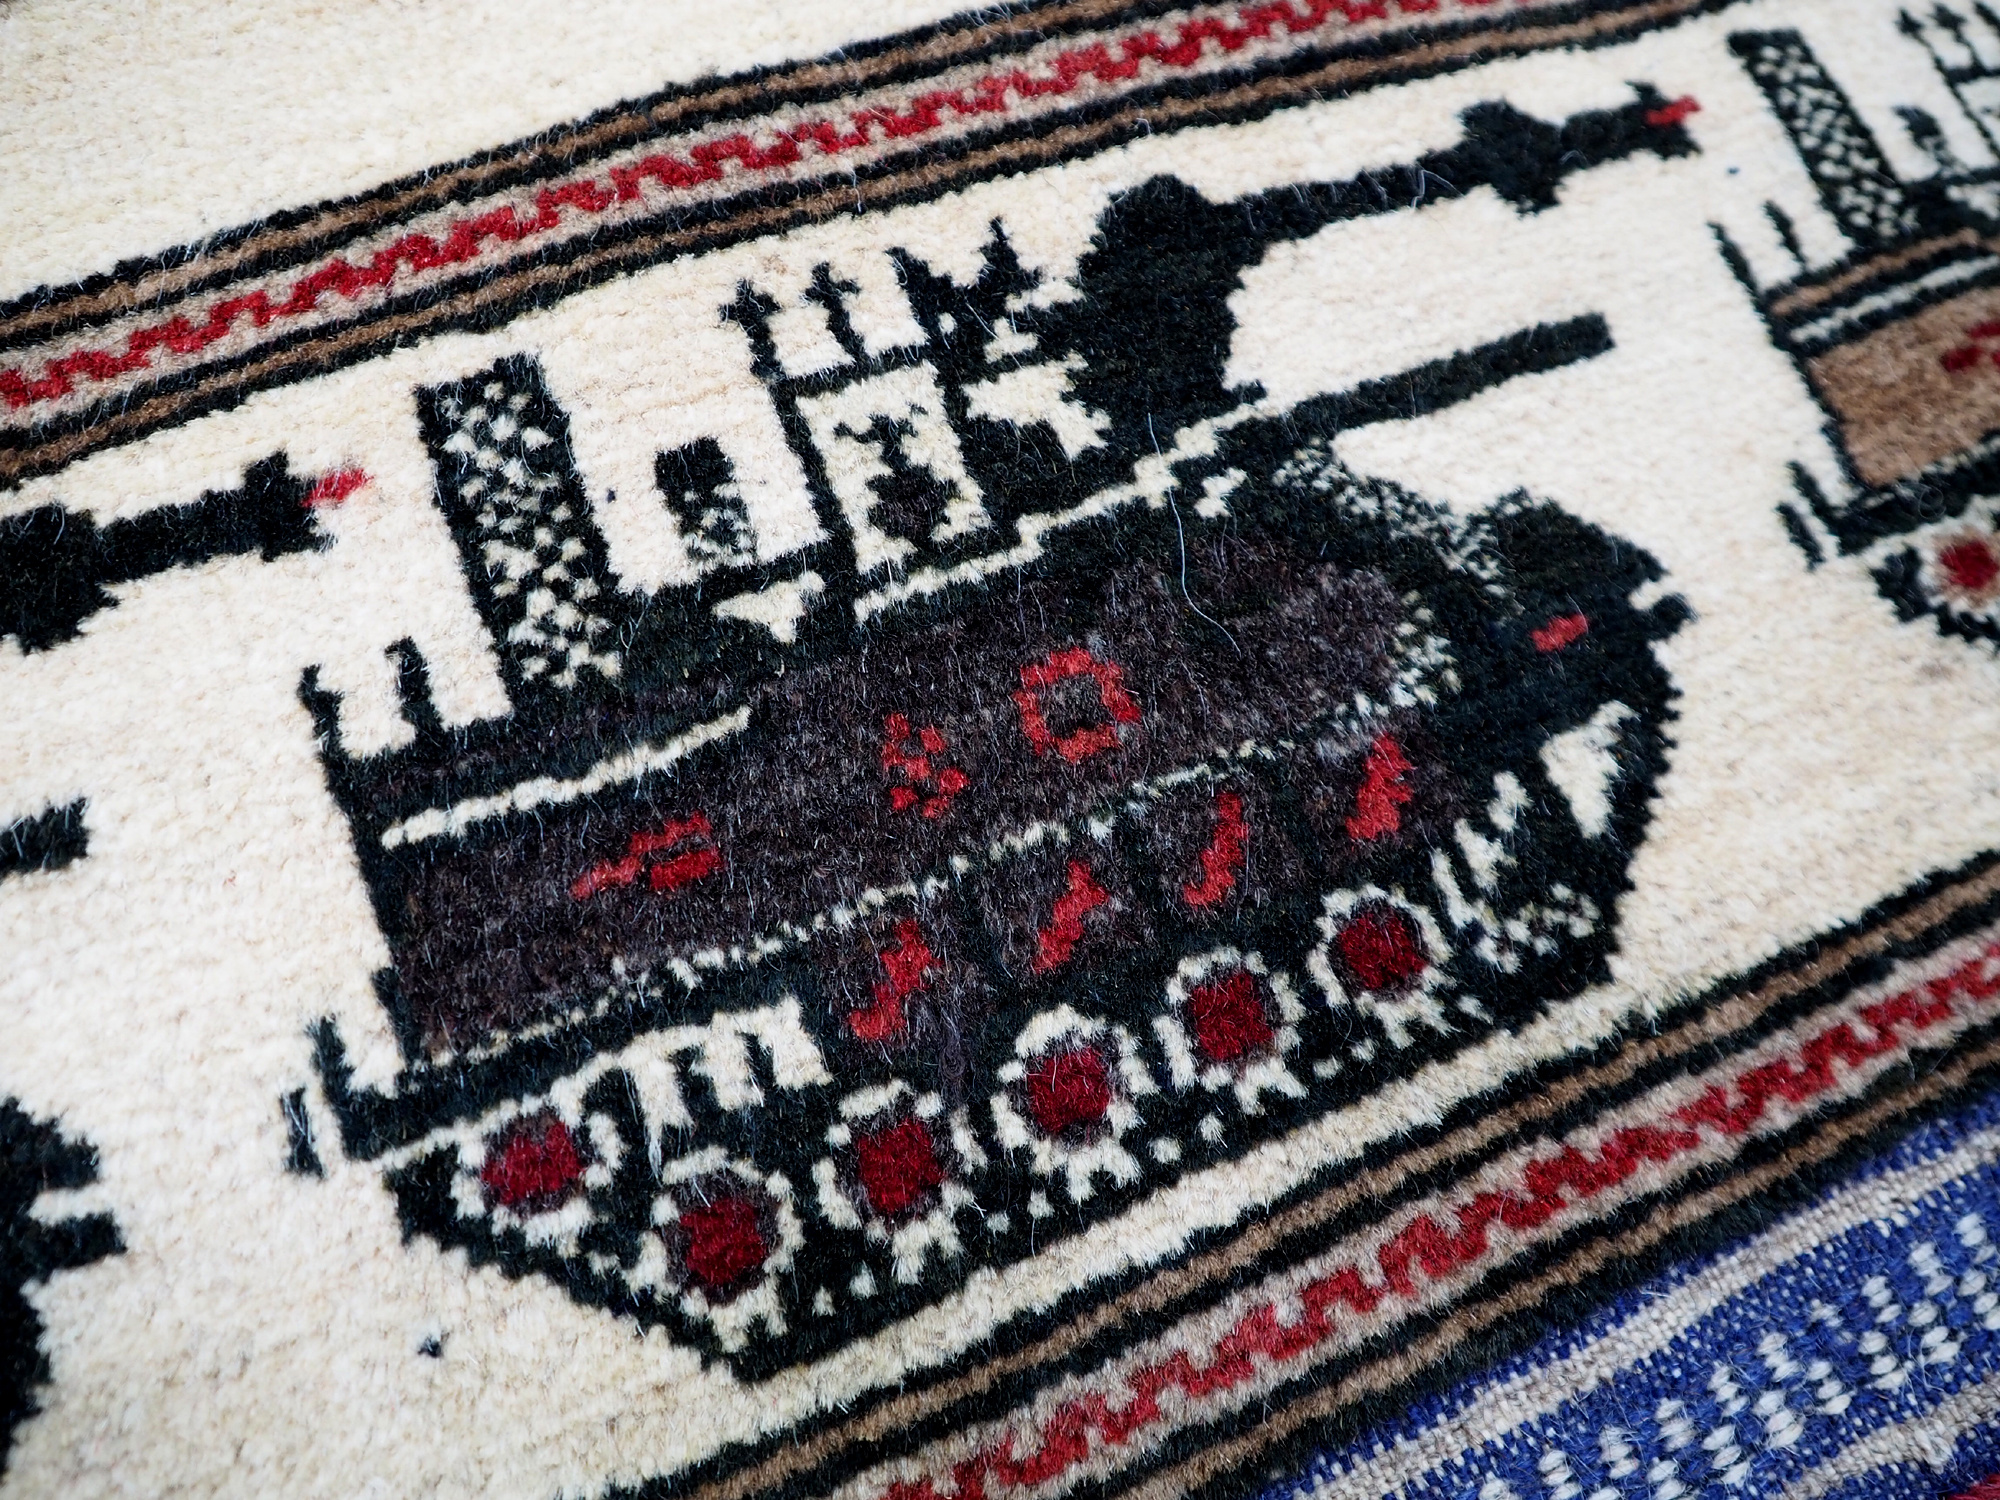 Afghan Kriegteppich Handgeknüpf Teppich Afghanistan panzer kampfjet gewehr USA Army Nato ISAF war rug Nr:19/ 29